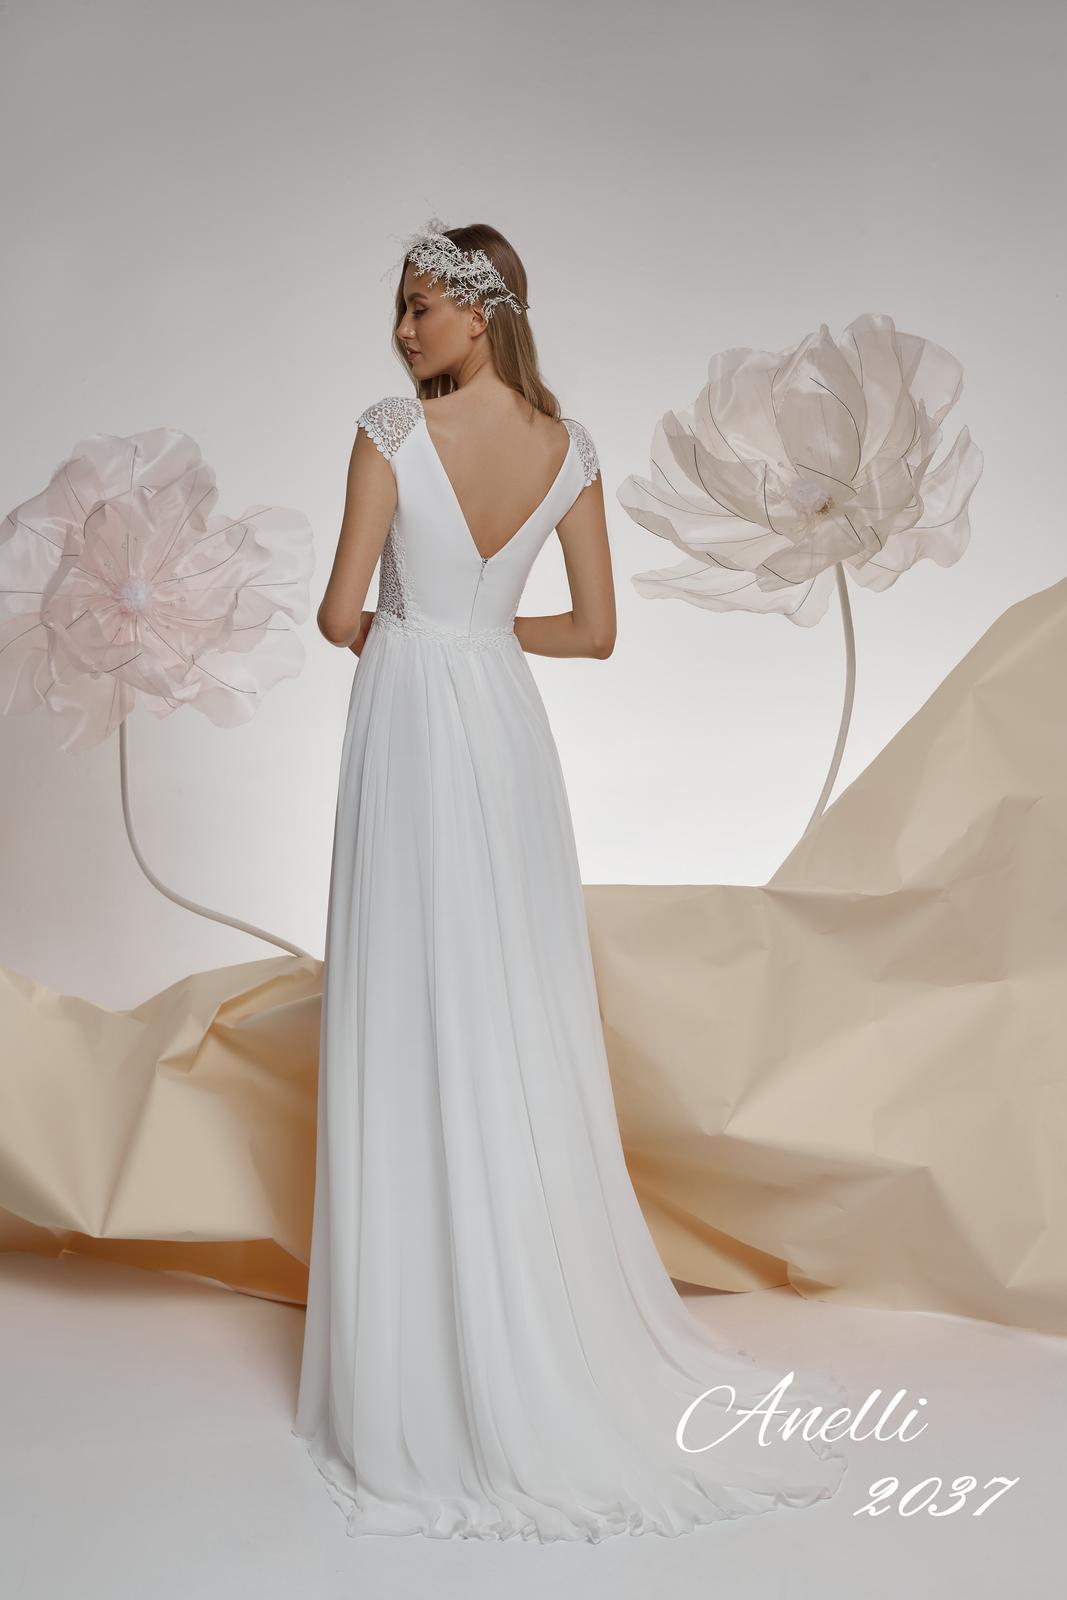 Svadobné šaty - Imagine 2037 - Obrázok č. 3